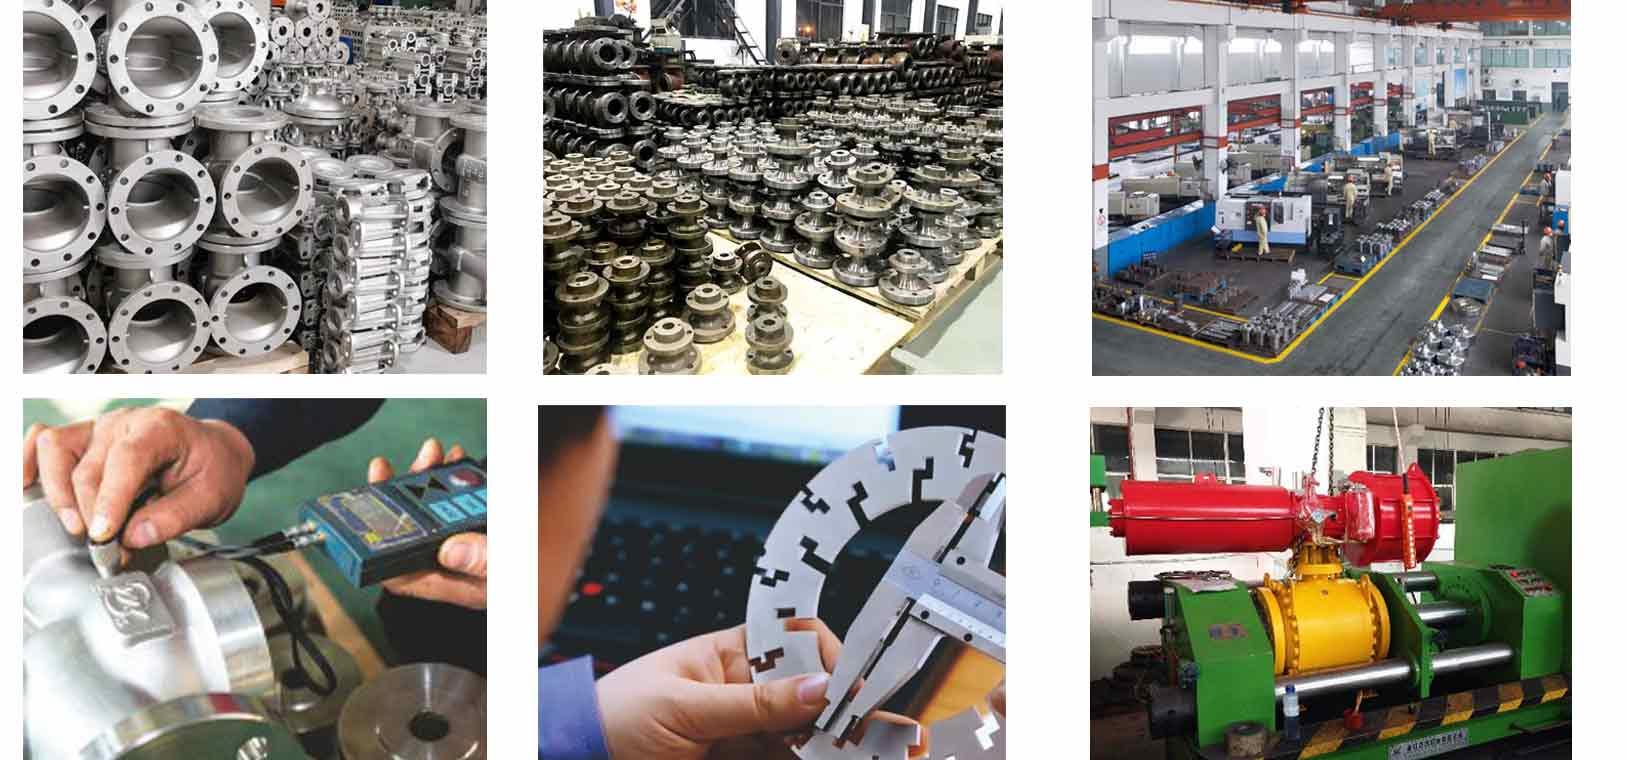 pneumatic control-valve-manufacturing